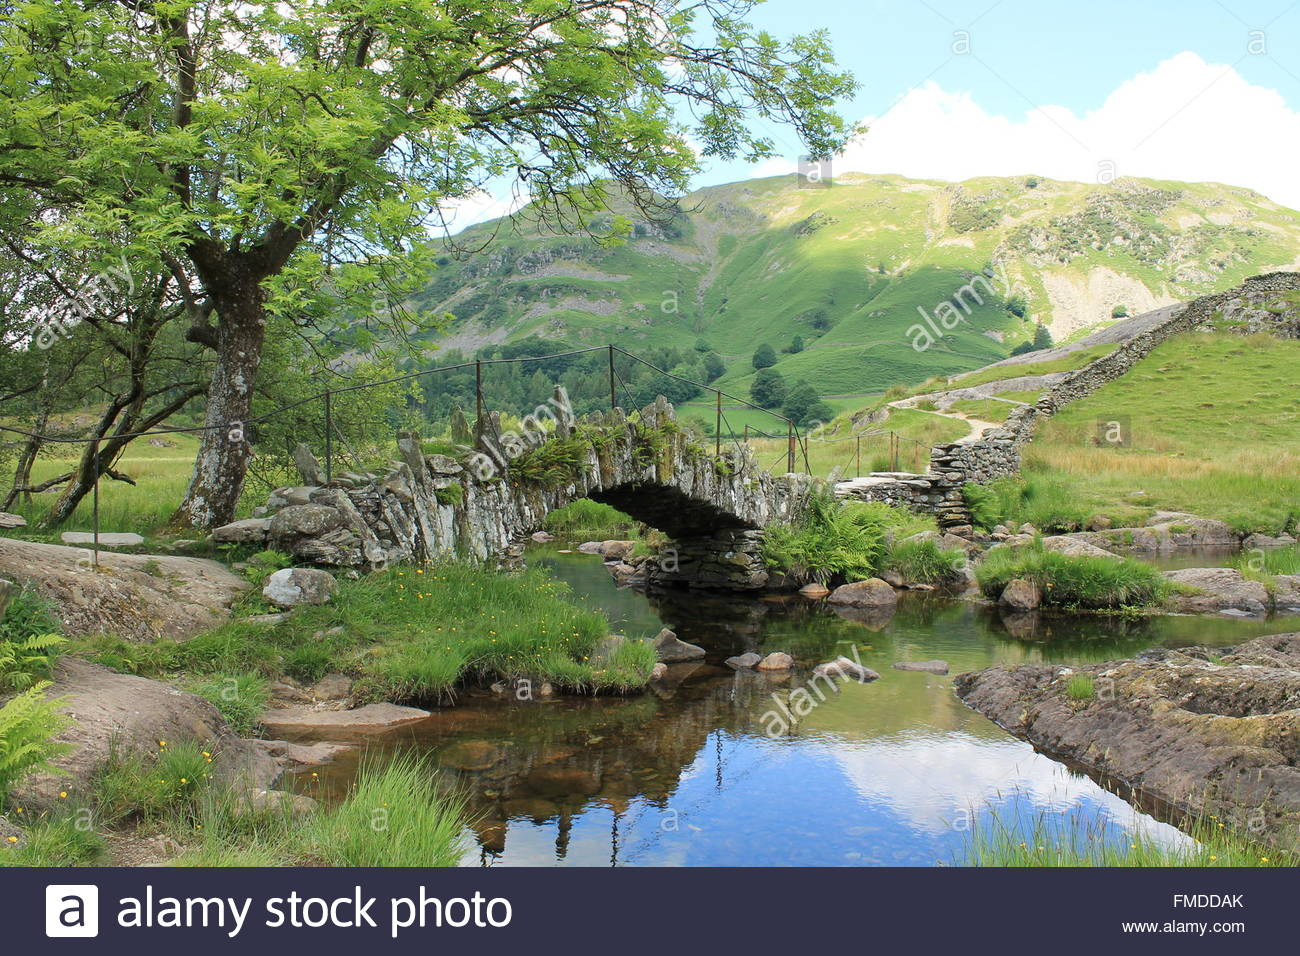 slaters-bridge-little-langdale-valley-in